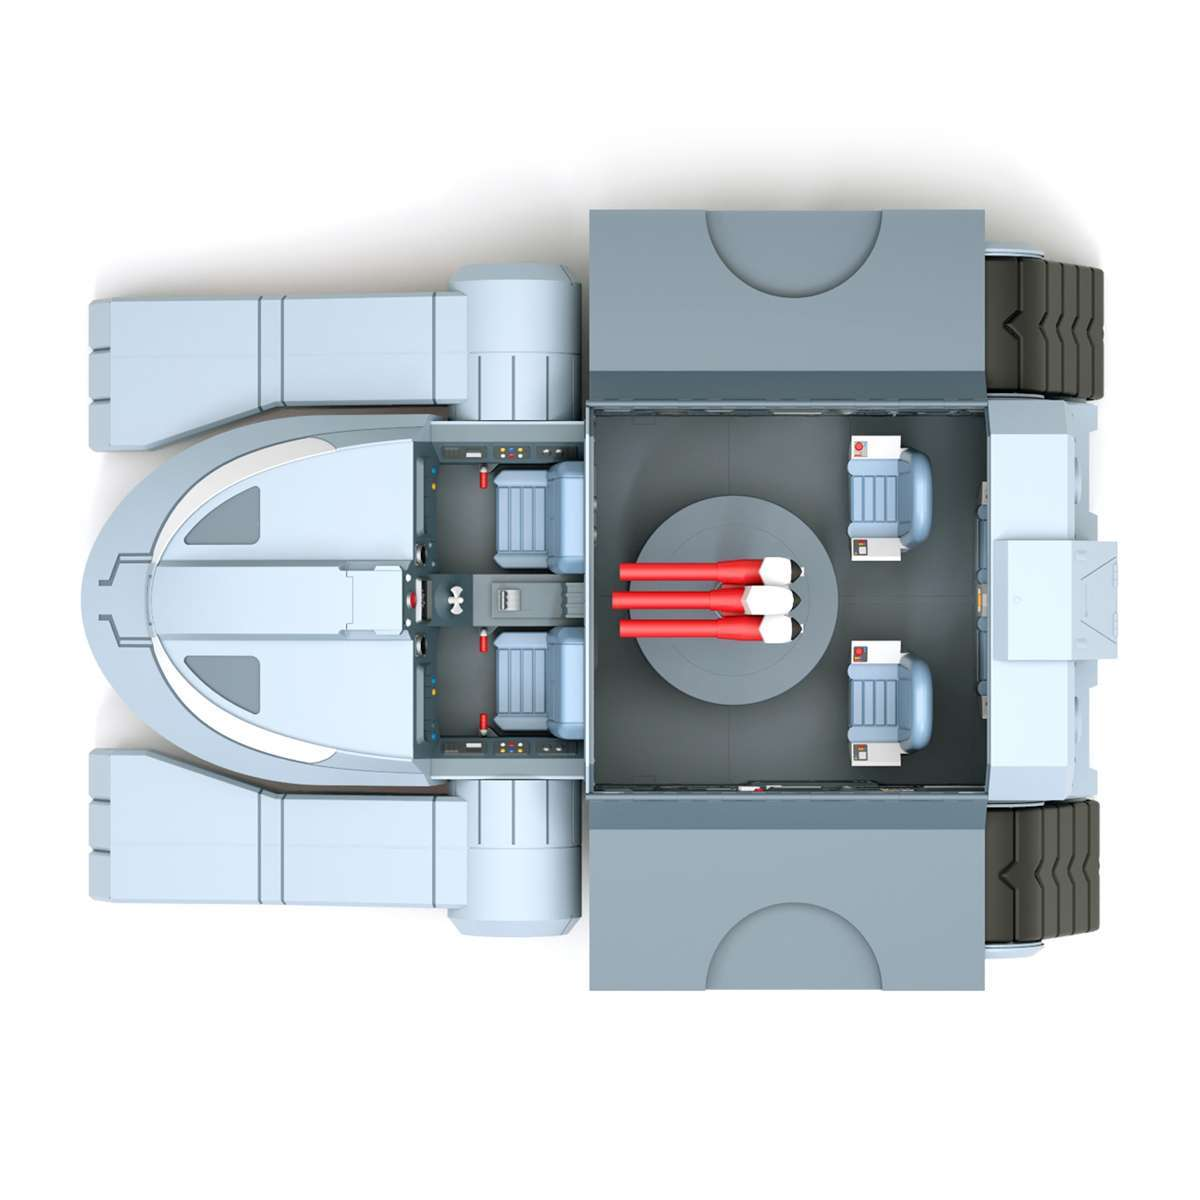 ThunderCats-Ultimates-ThunderTank_Top_03_1200